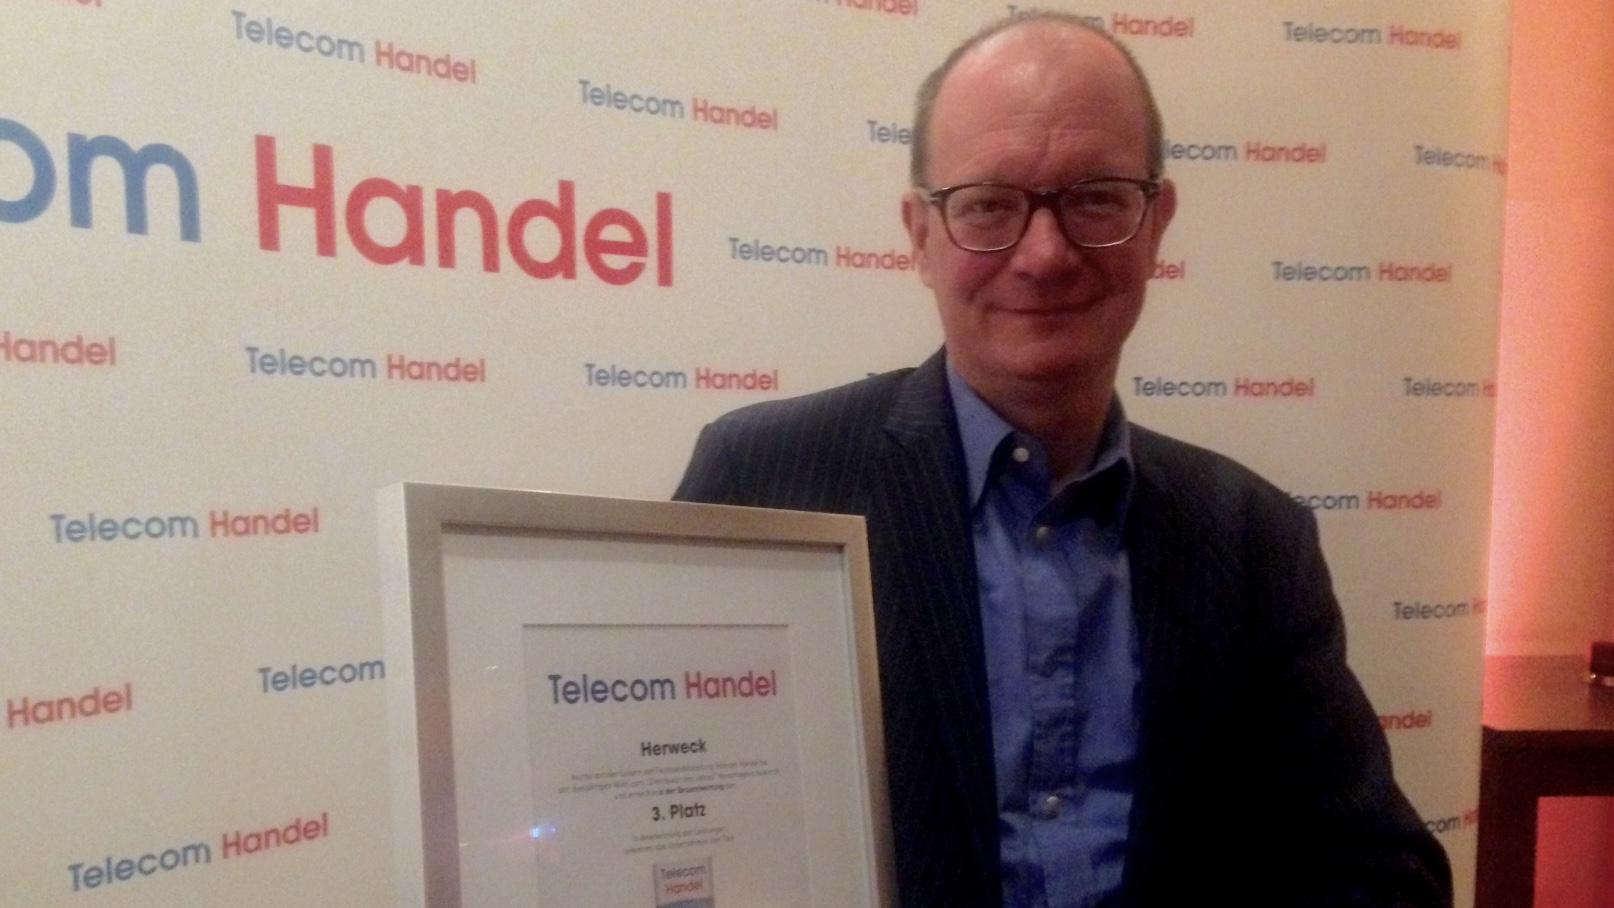 Telecom Handel Leserwahl: Herweck ist Premium Distributor